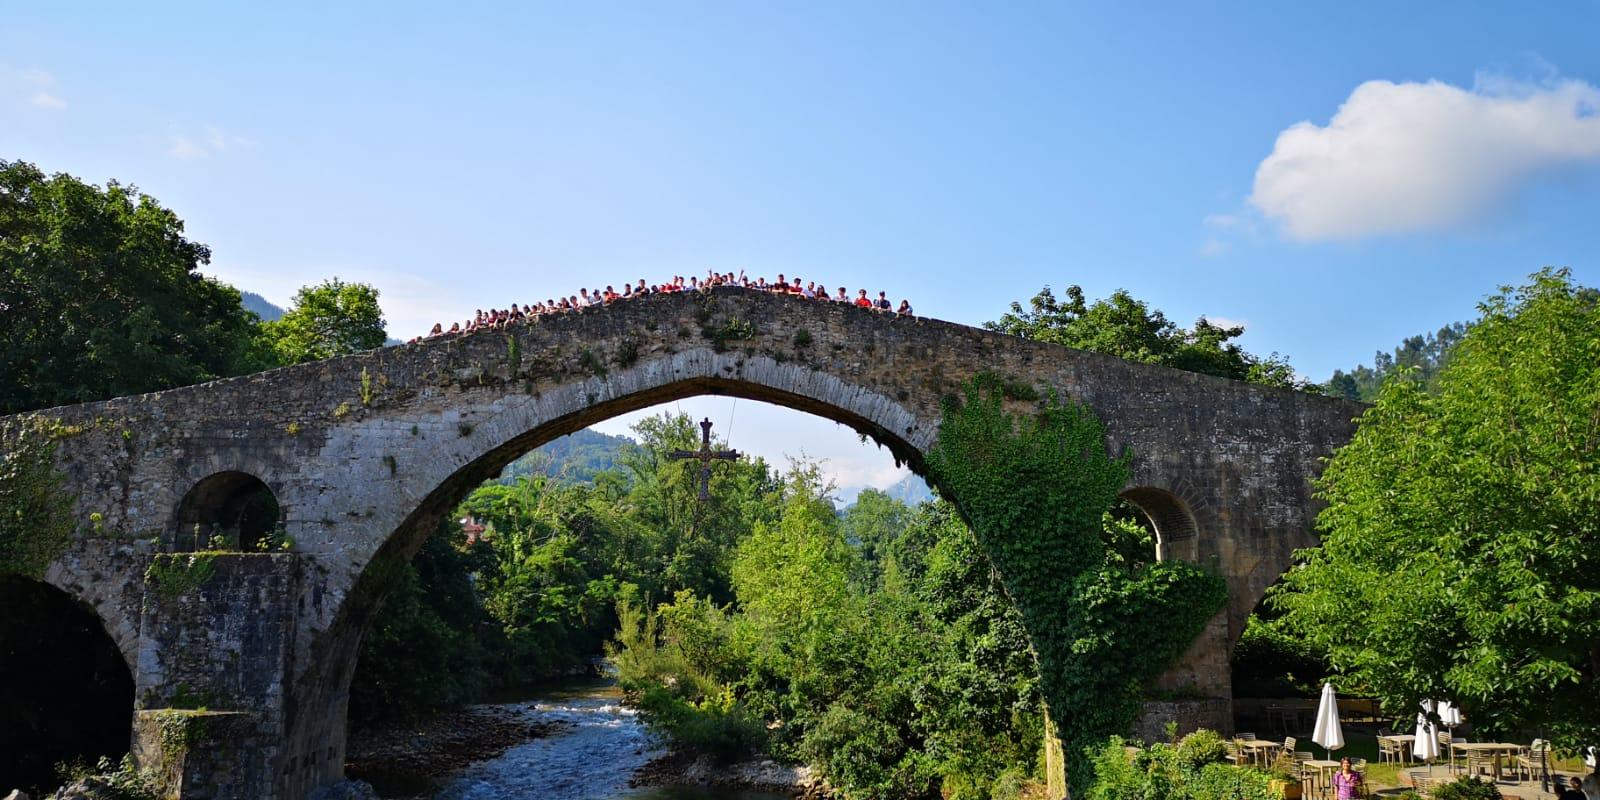 Excursión Cangas de Onis. Diario campamento multiaventura Asturias 2019